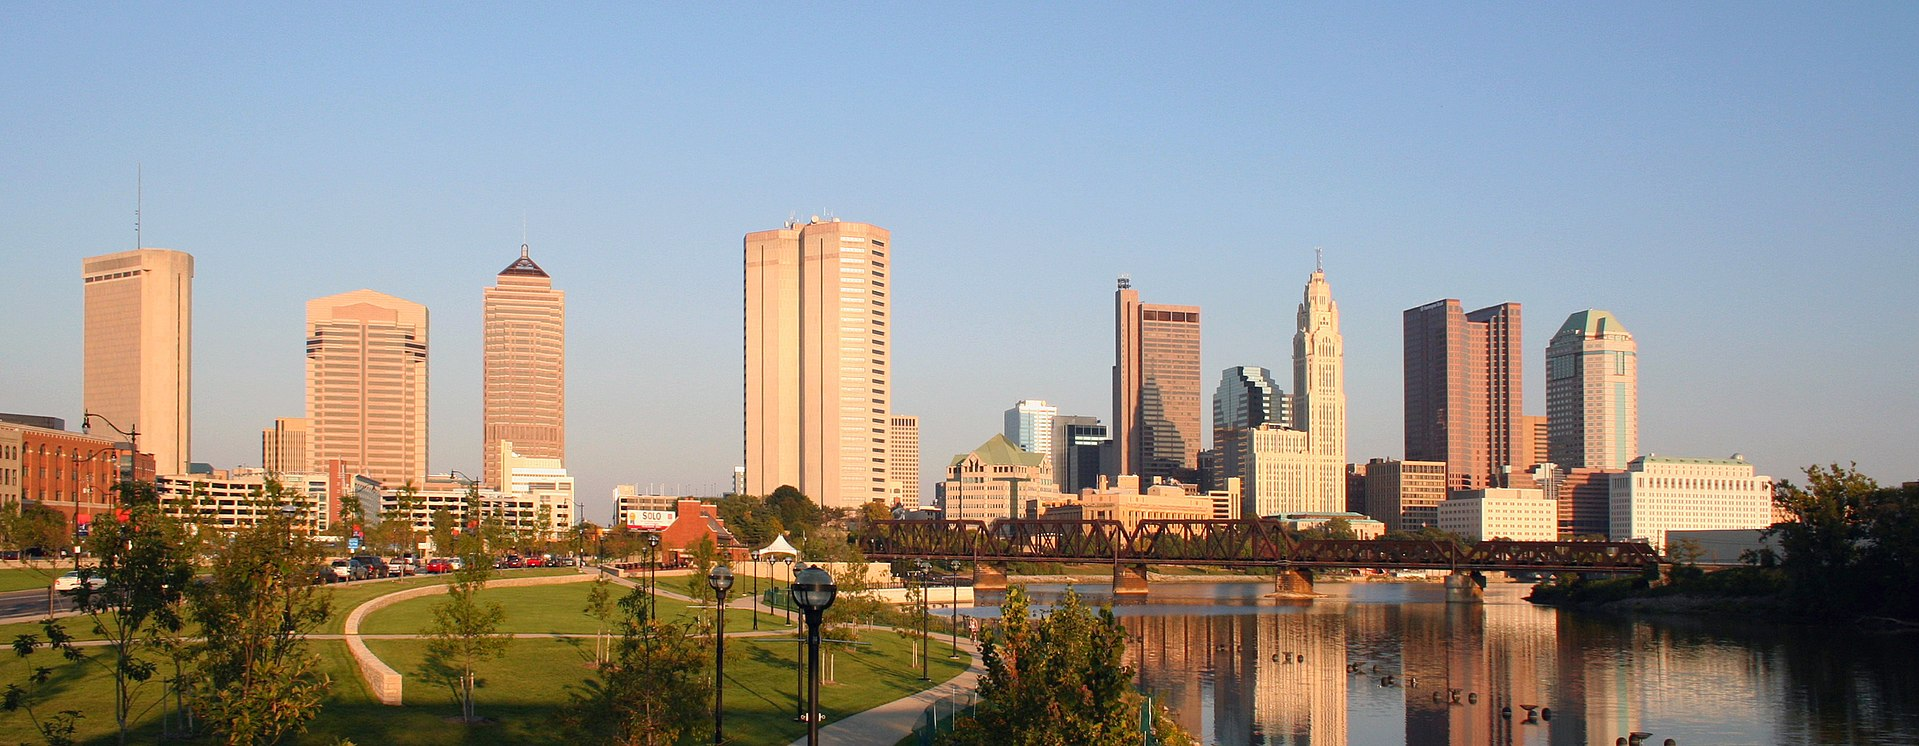 List of tallest buildings in Columbus, Ohio - Wikipedia